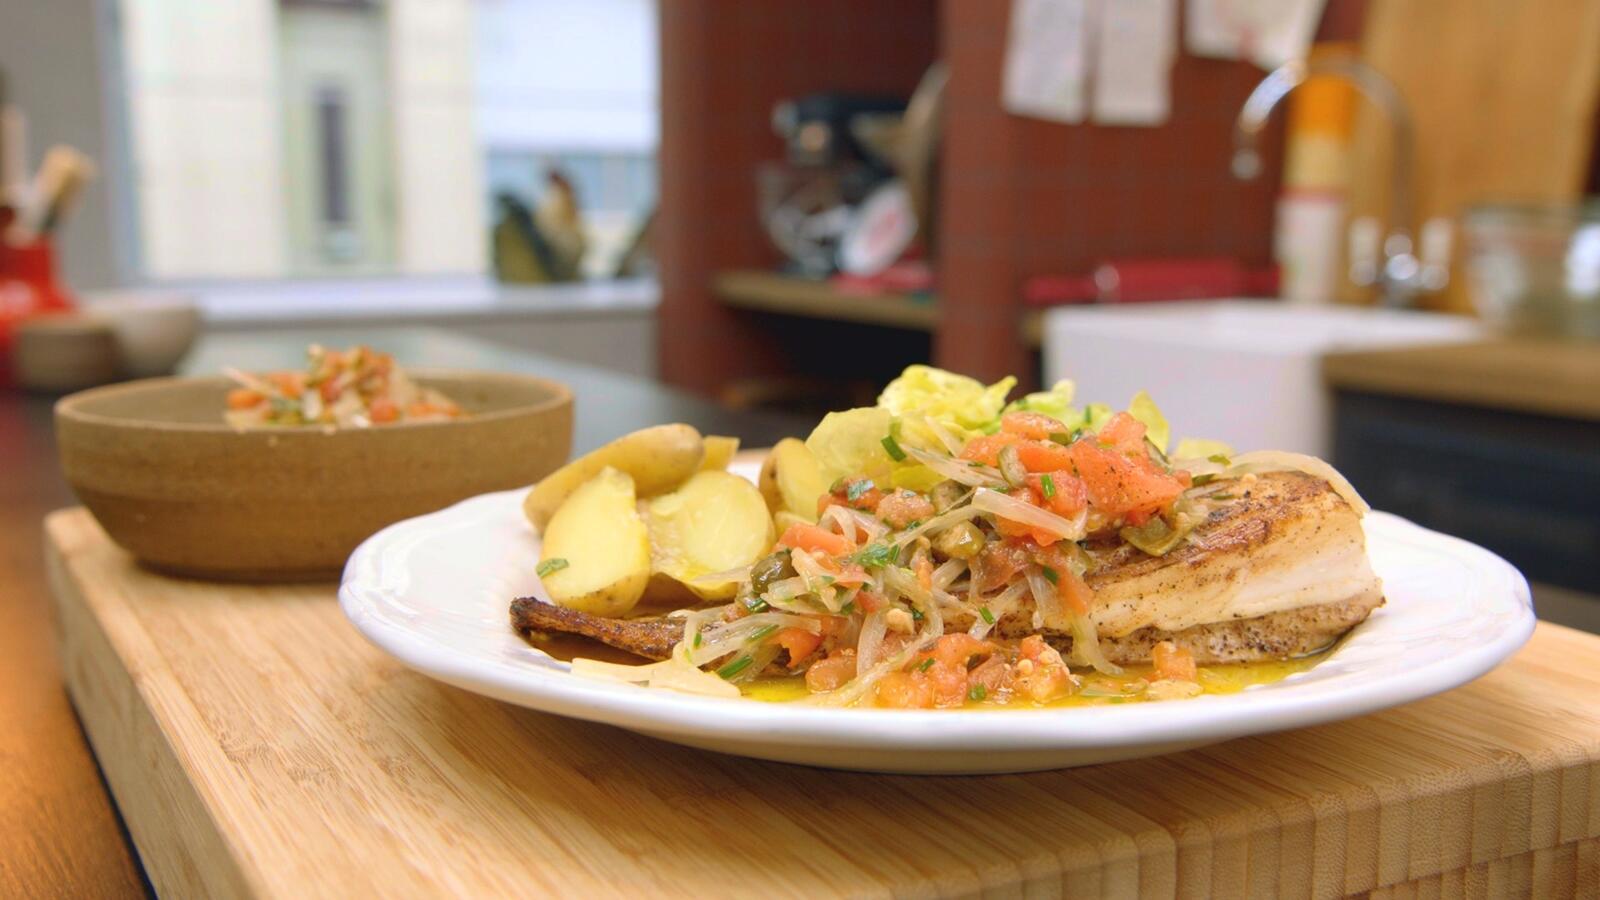 Rog met kappertjesvinaigrette en aardappelen